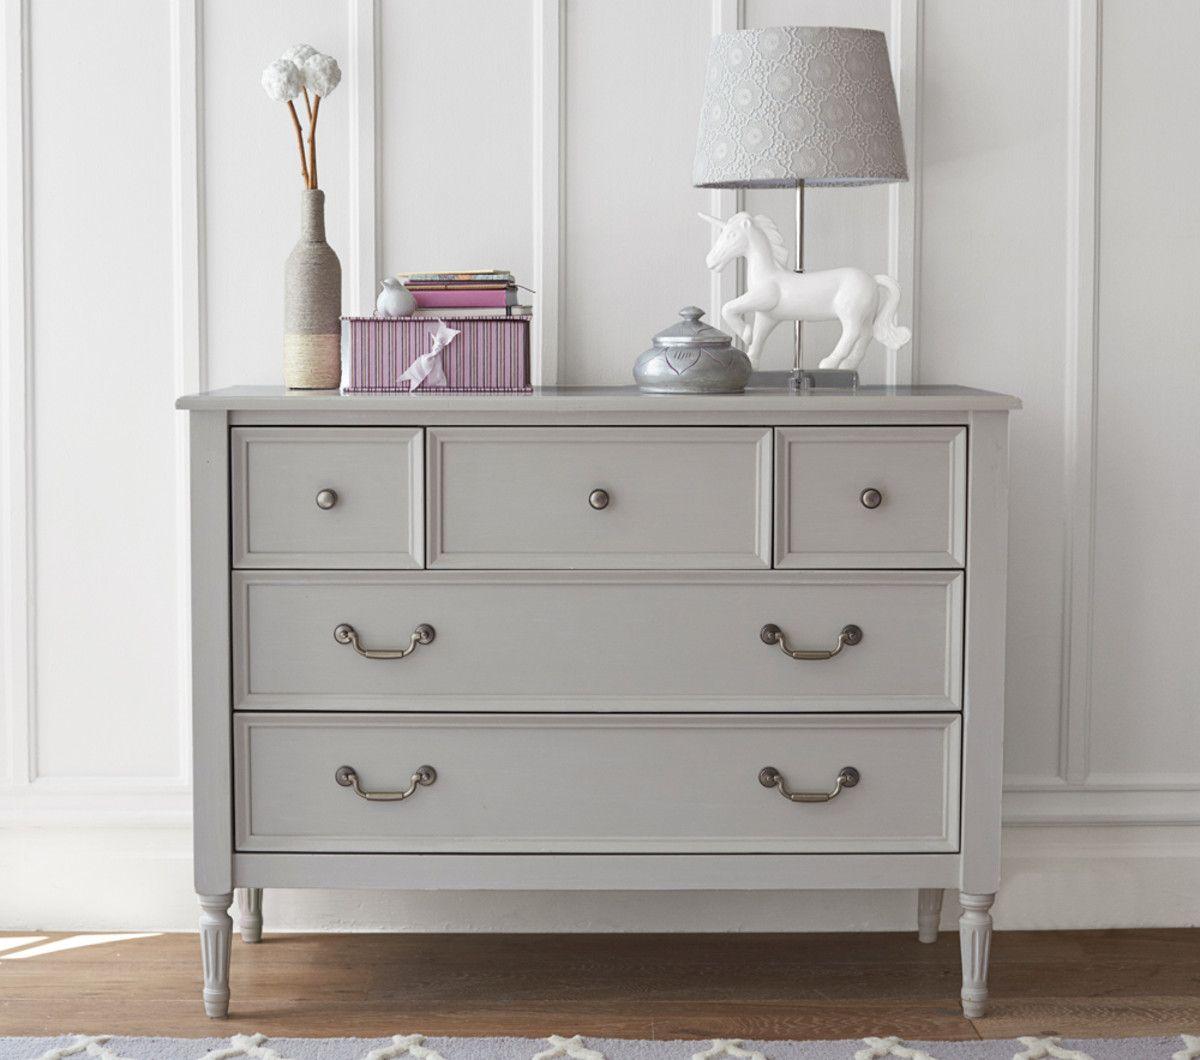 Blythe Dresser Vintage Grey Grey Furniture Dresser As Nightstand Dresser [ 1060 x 1200 Pixel ]